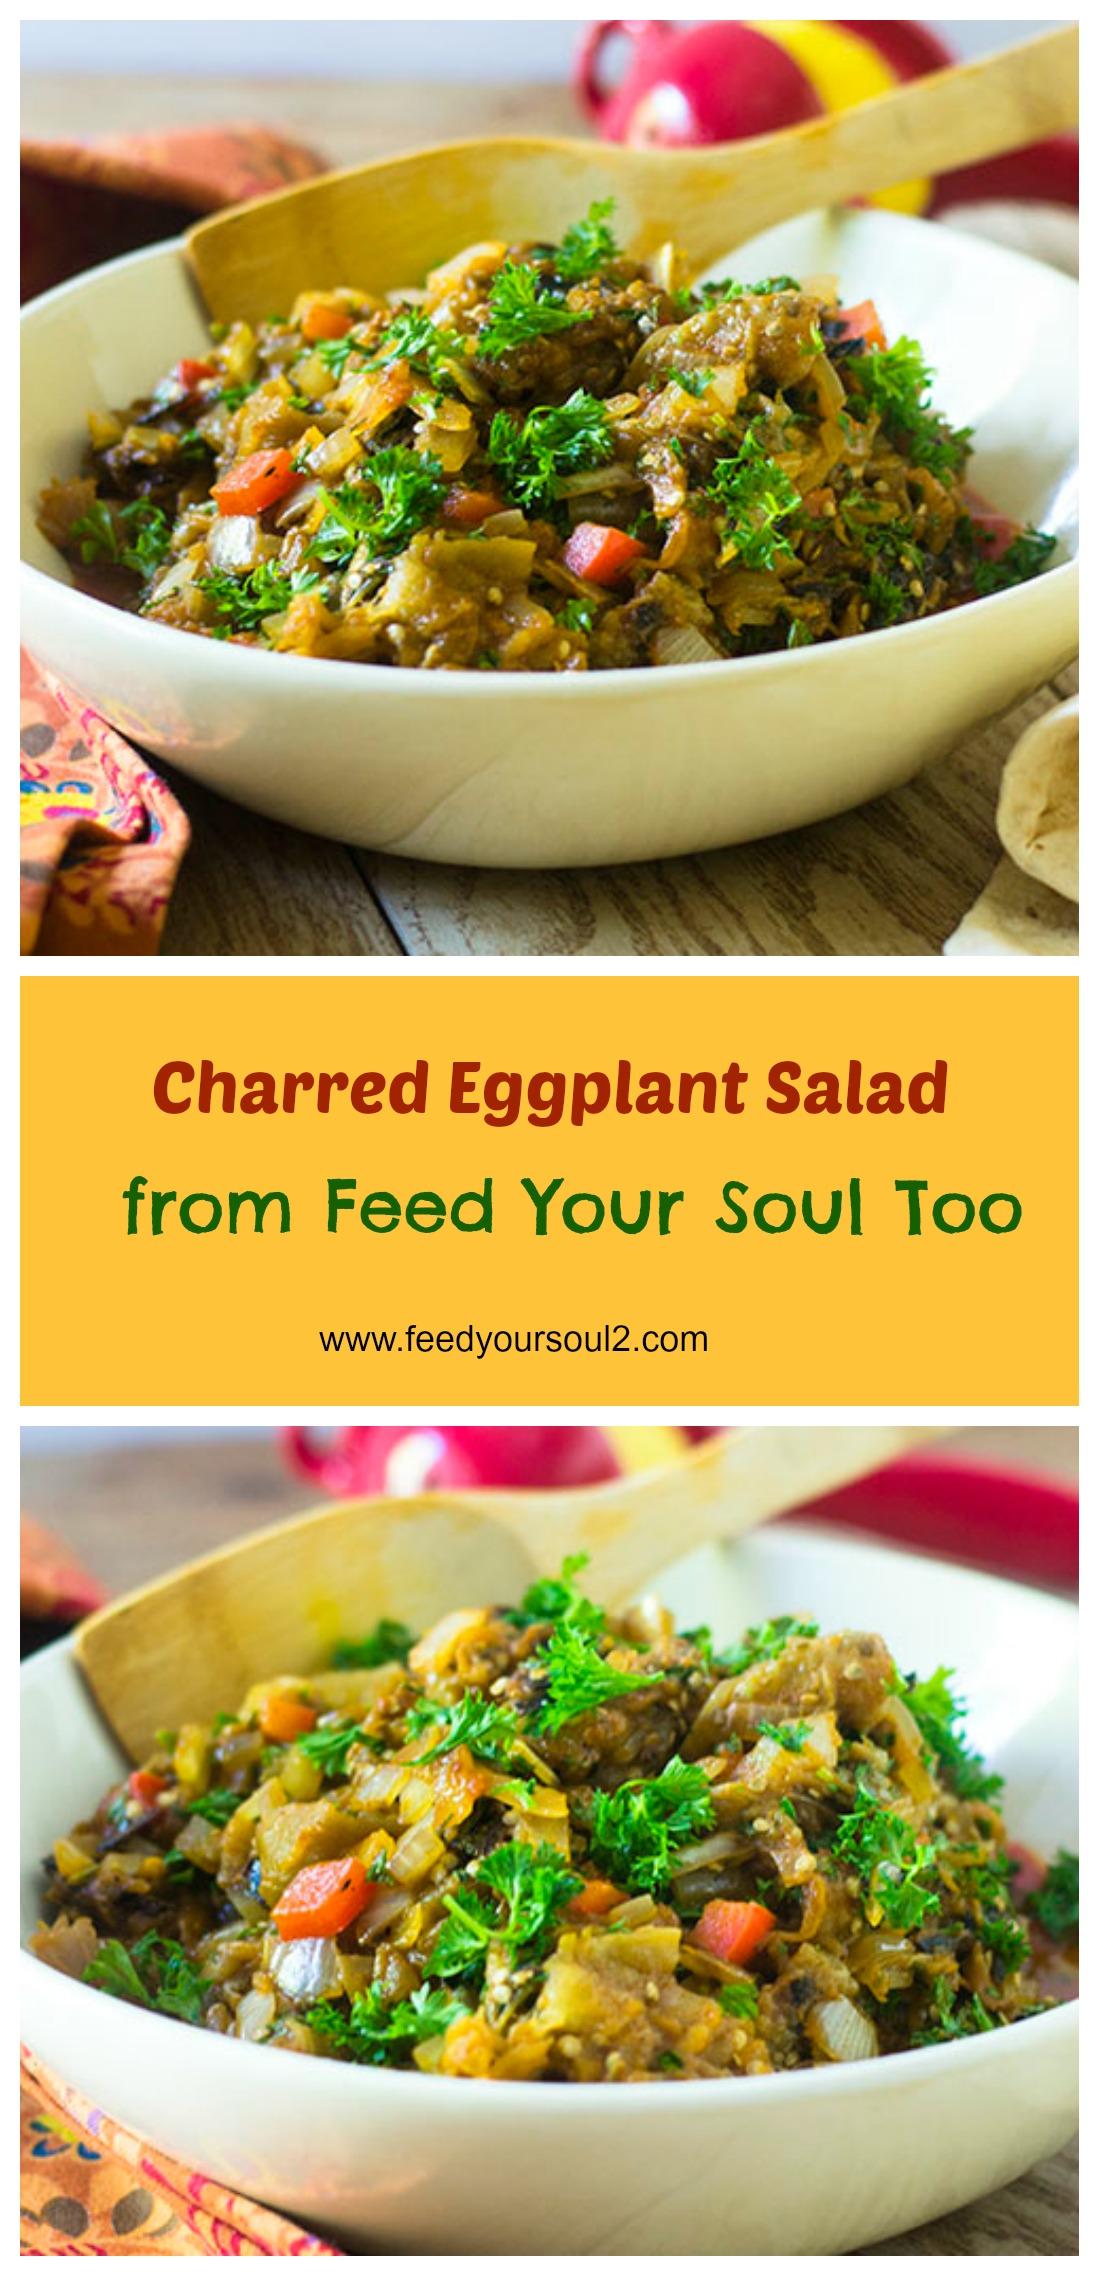 Charred Eggplant Salad #vegan #salad #eggplant | feedyoursoul2.com